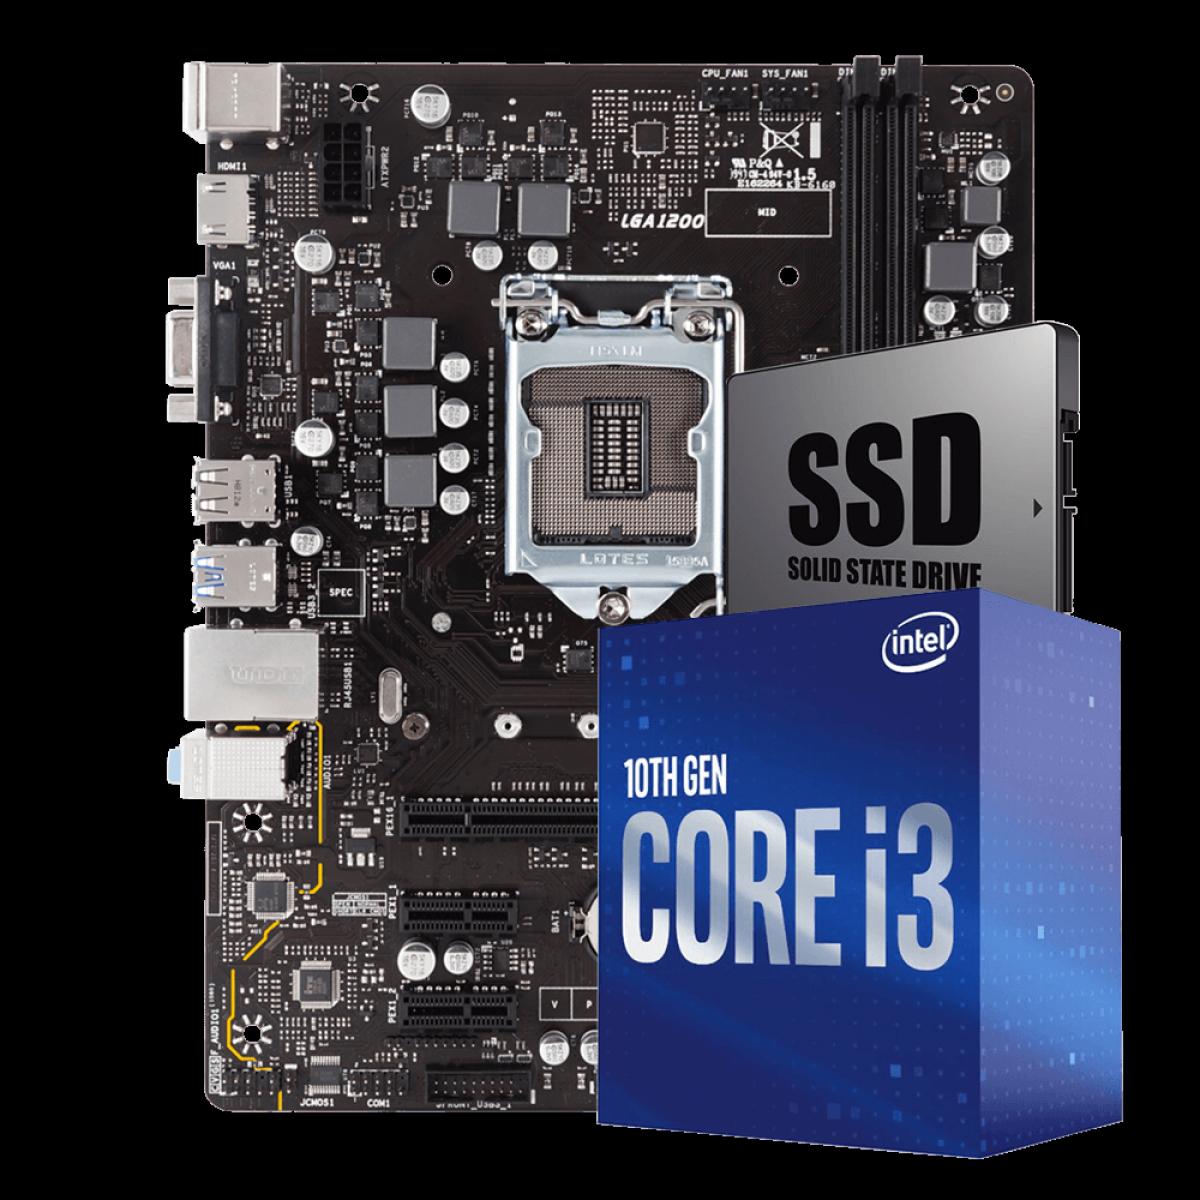 Kit Upgrade Biostar H410MH VER 6.0 + Intel Core i3 10100F + SSD 120GB